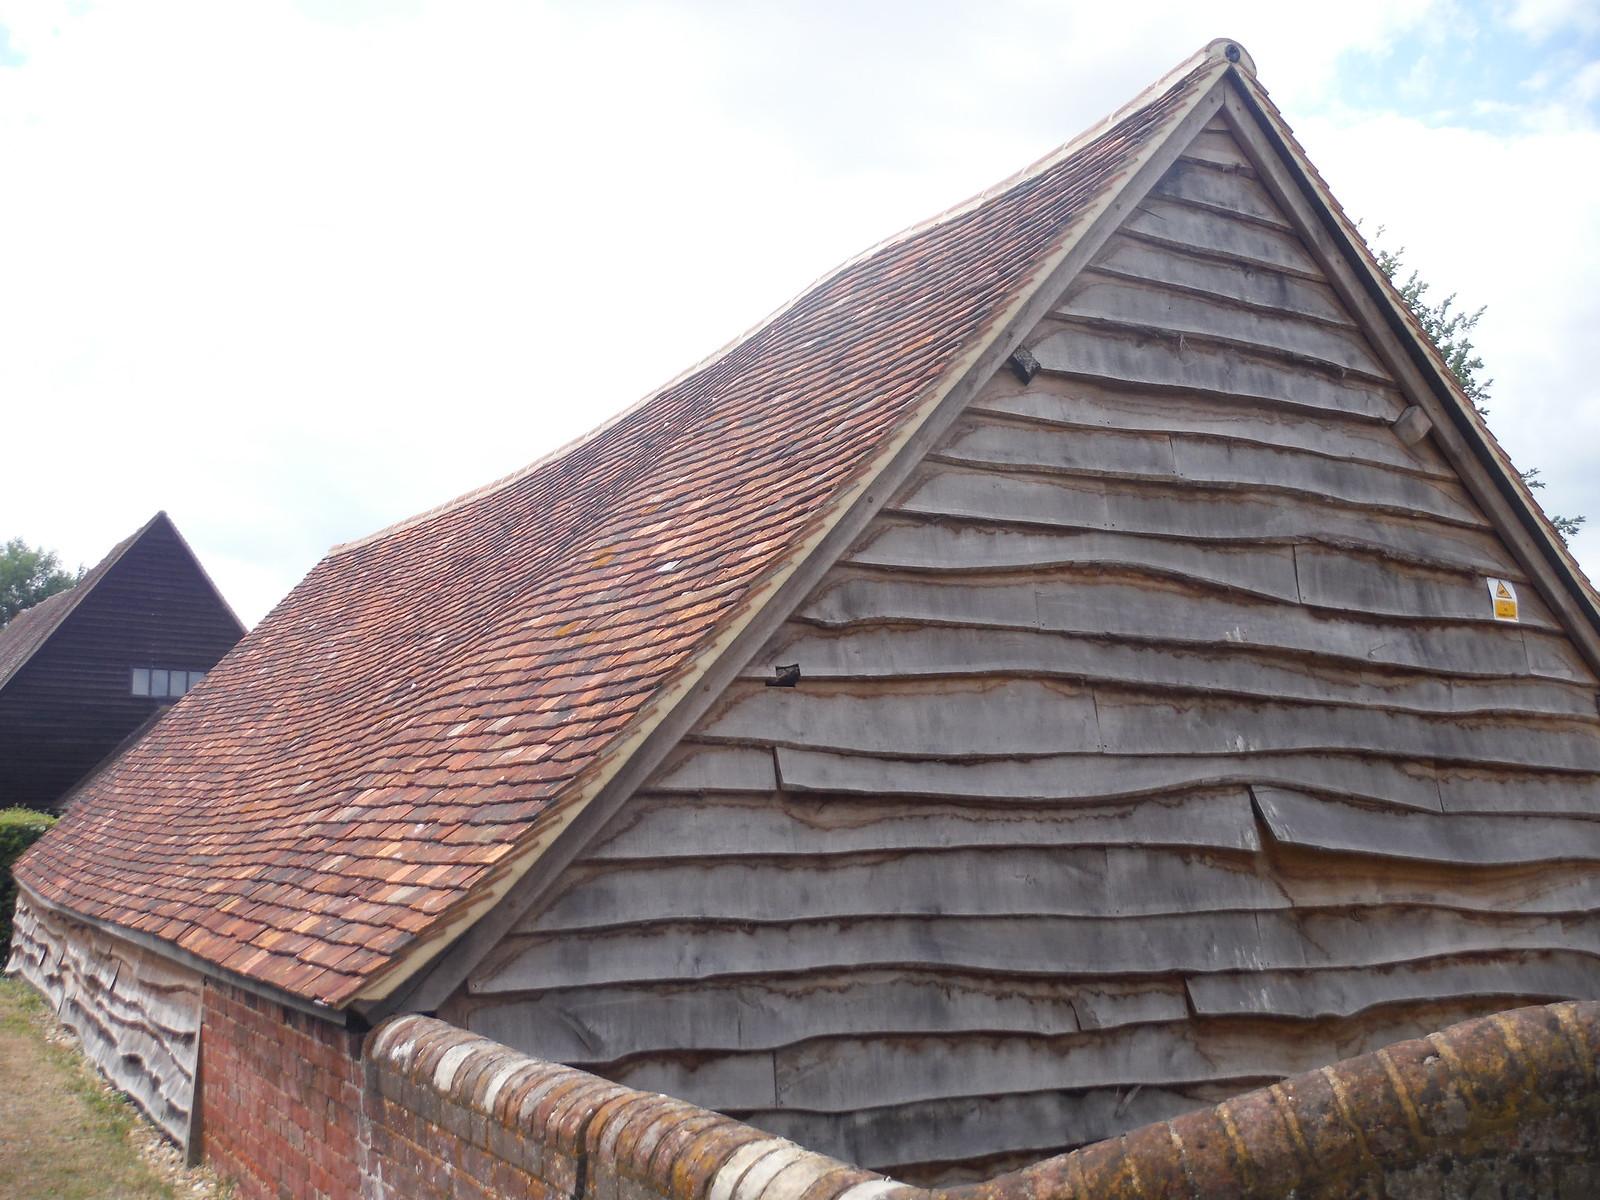 Barn at Rectory Manor, Pirton SWC Walk 233 - Arlesey to Letchworth Garden City